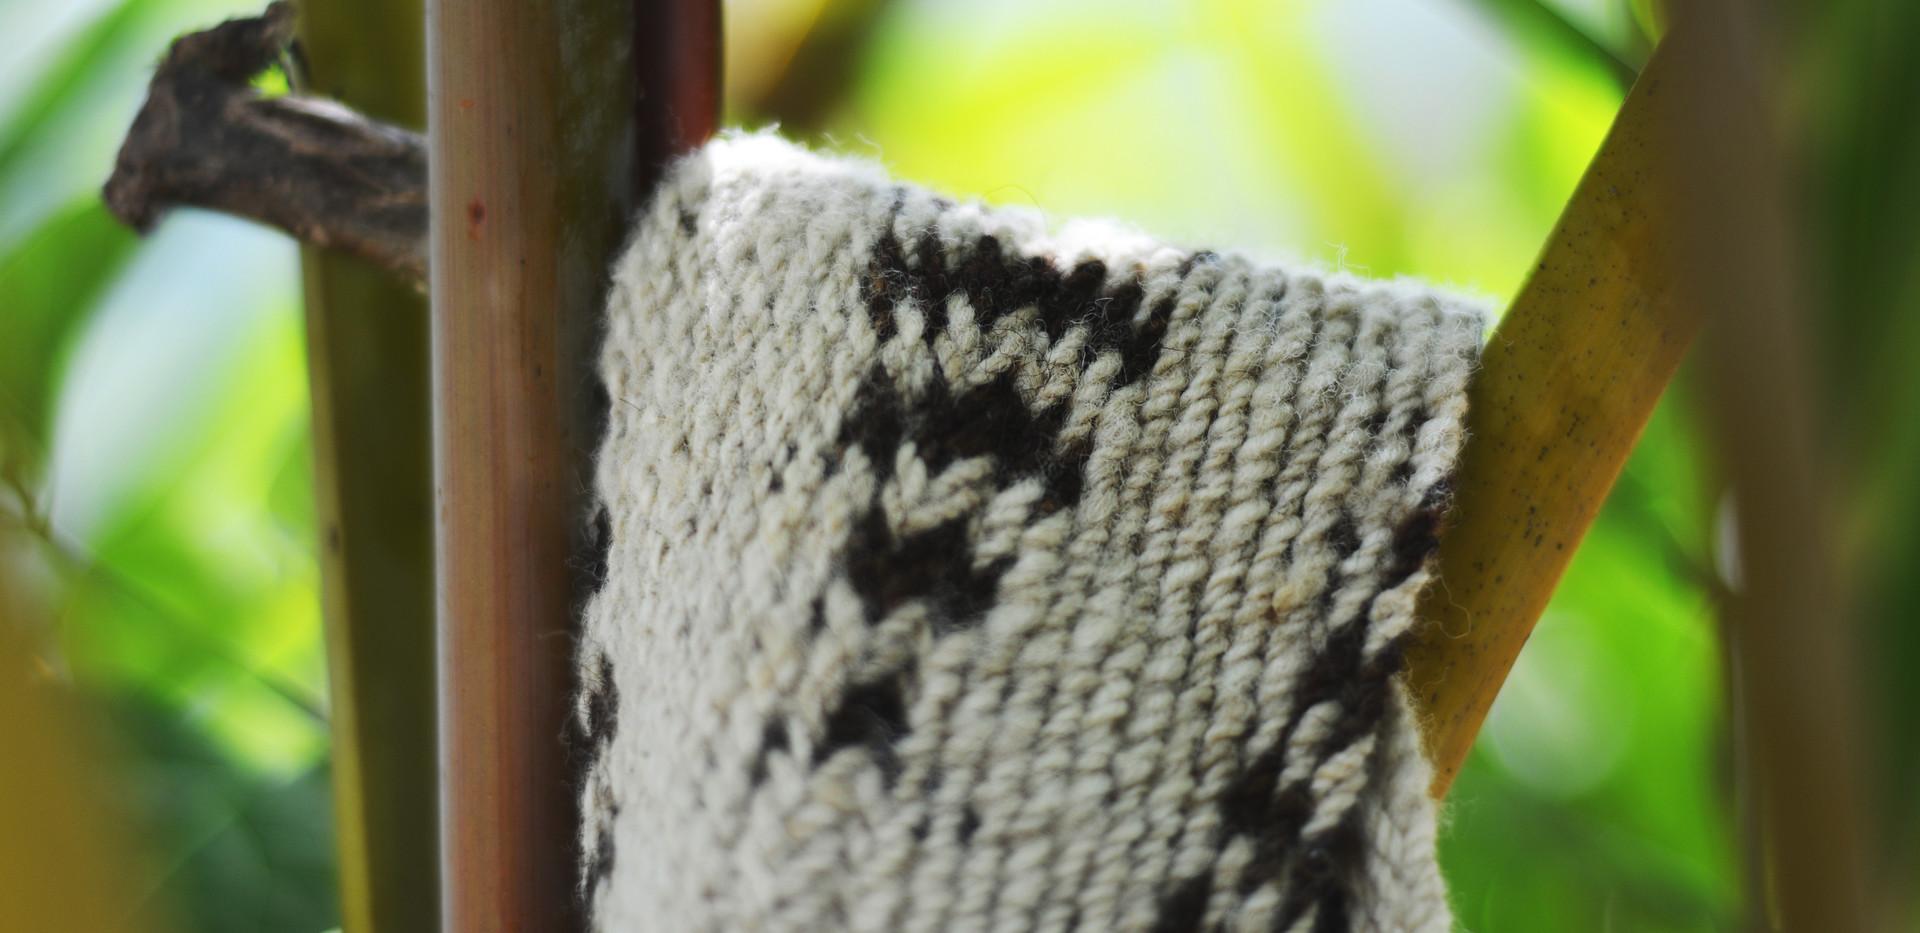 Detalle mochila tejida a mano